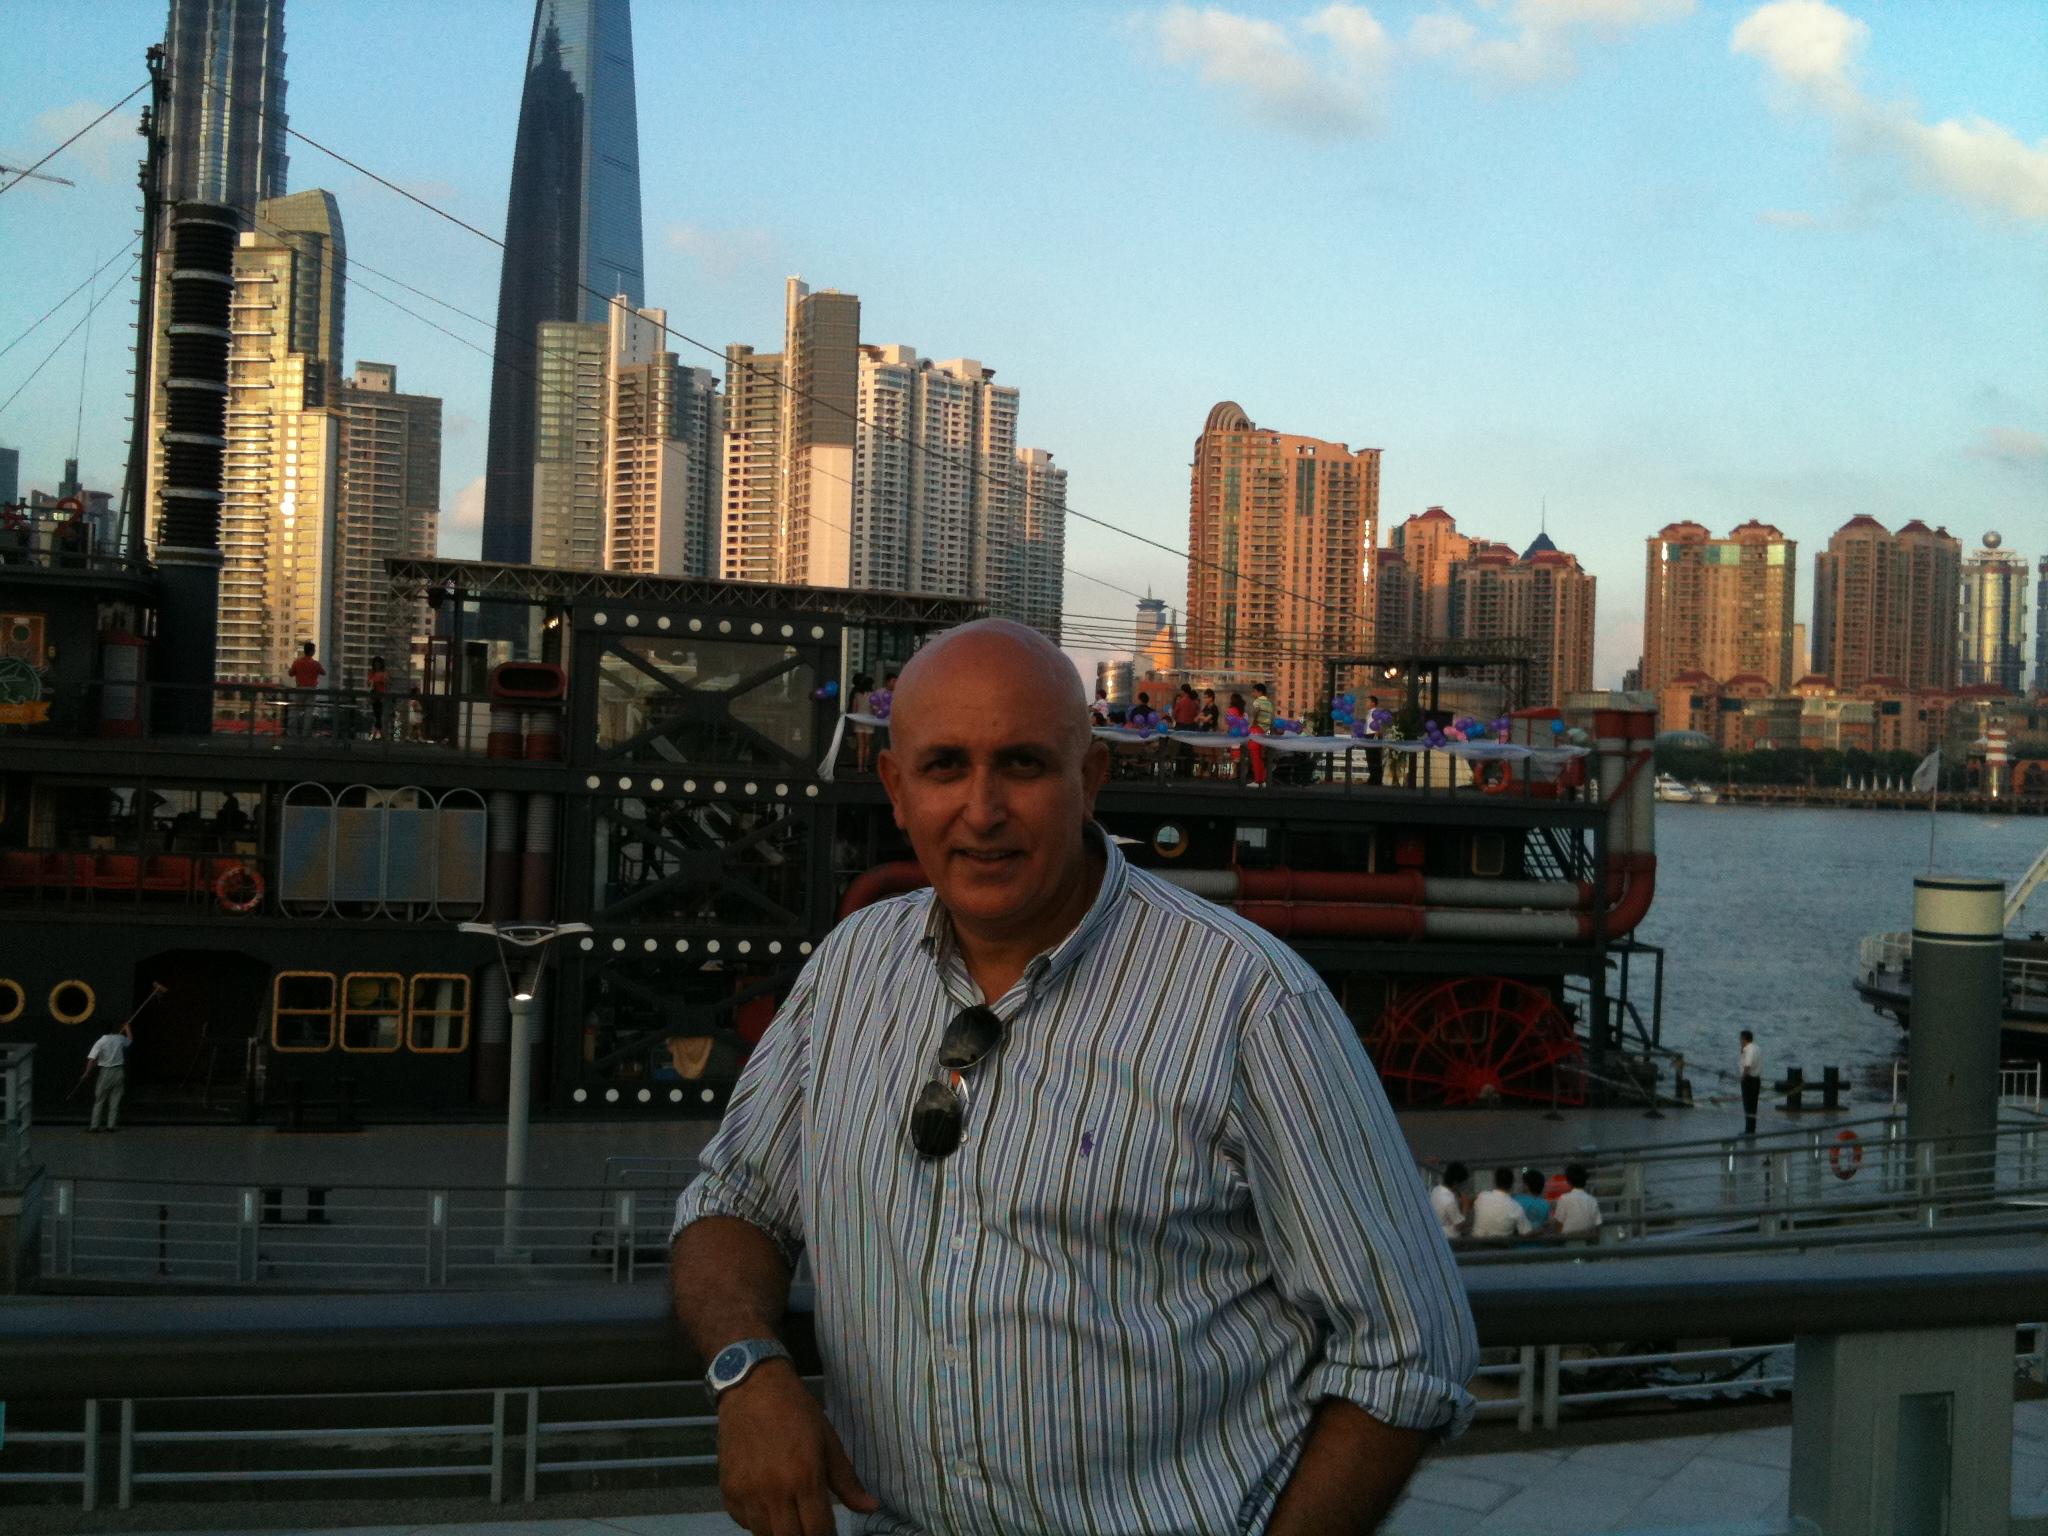 Shanghai_settembre 2010